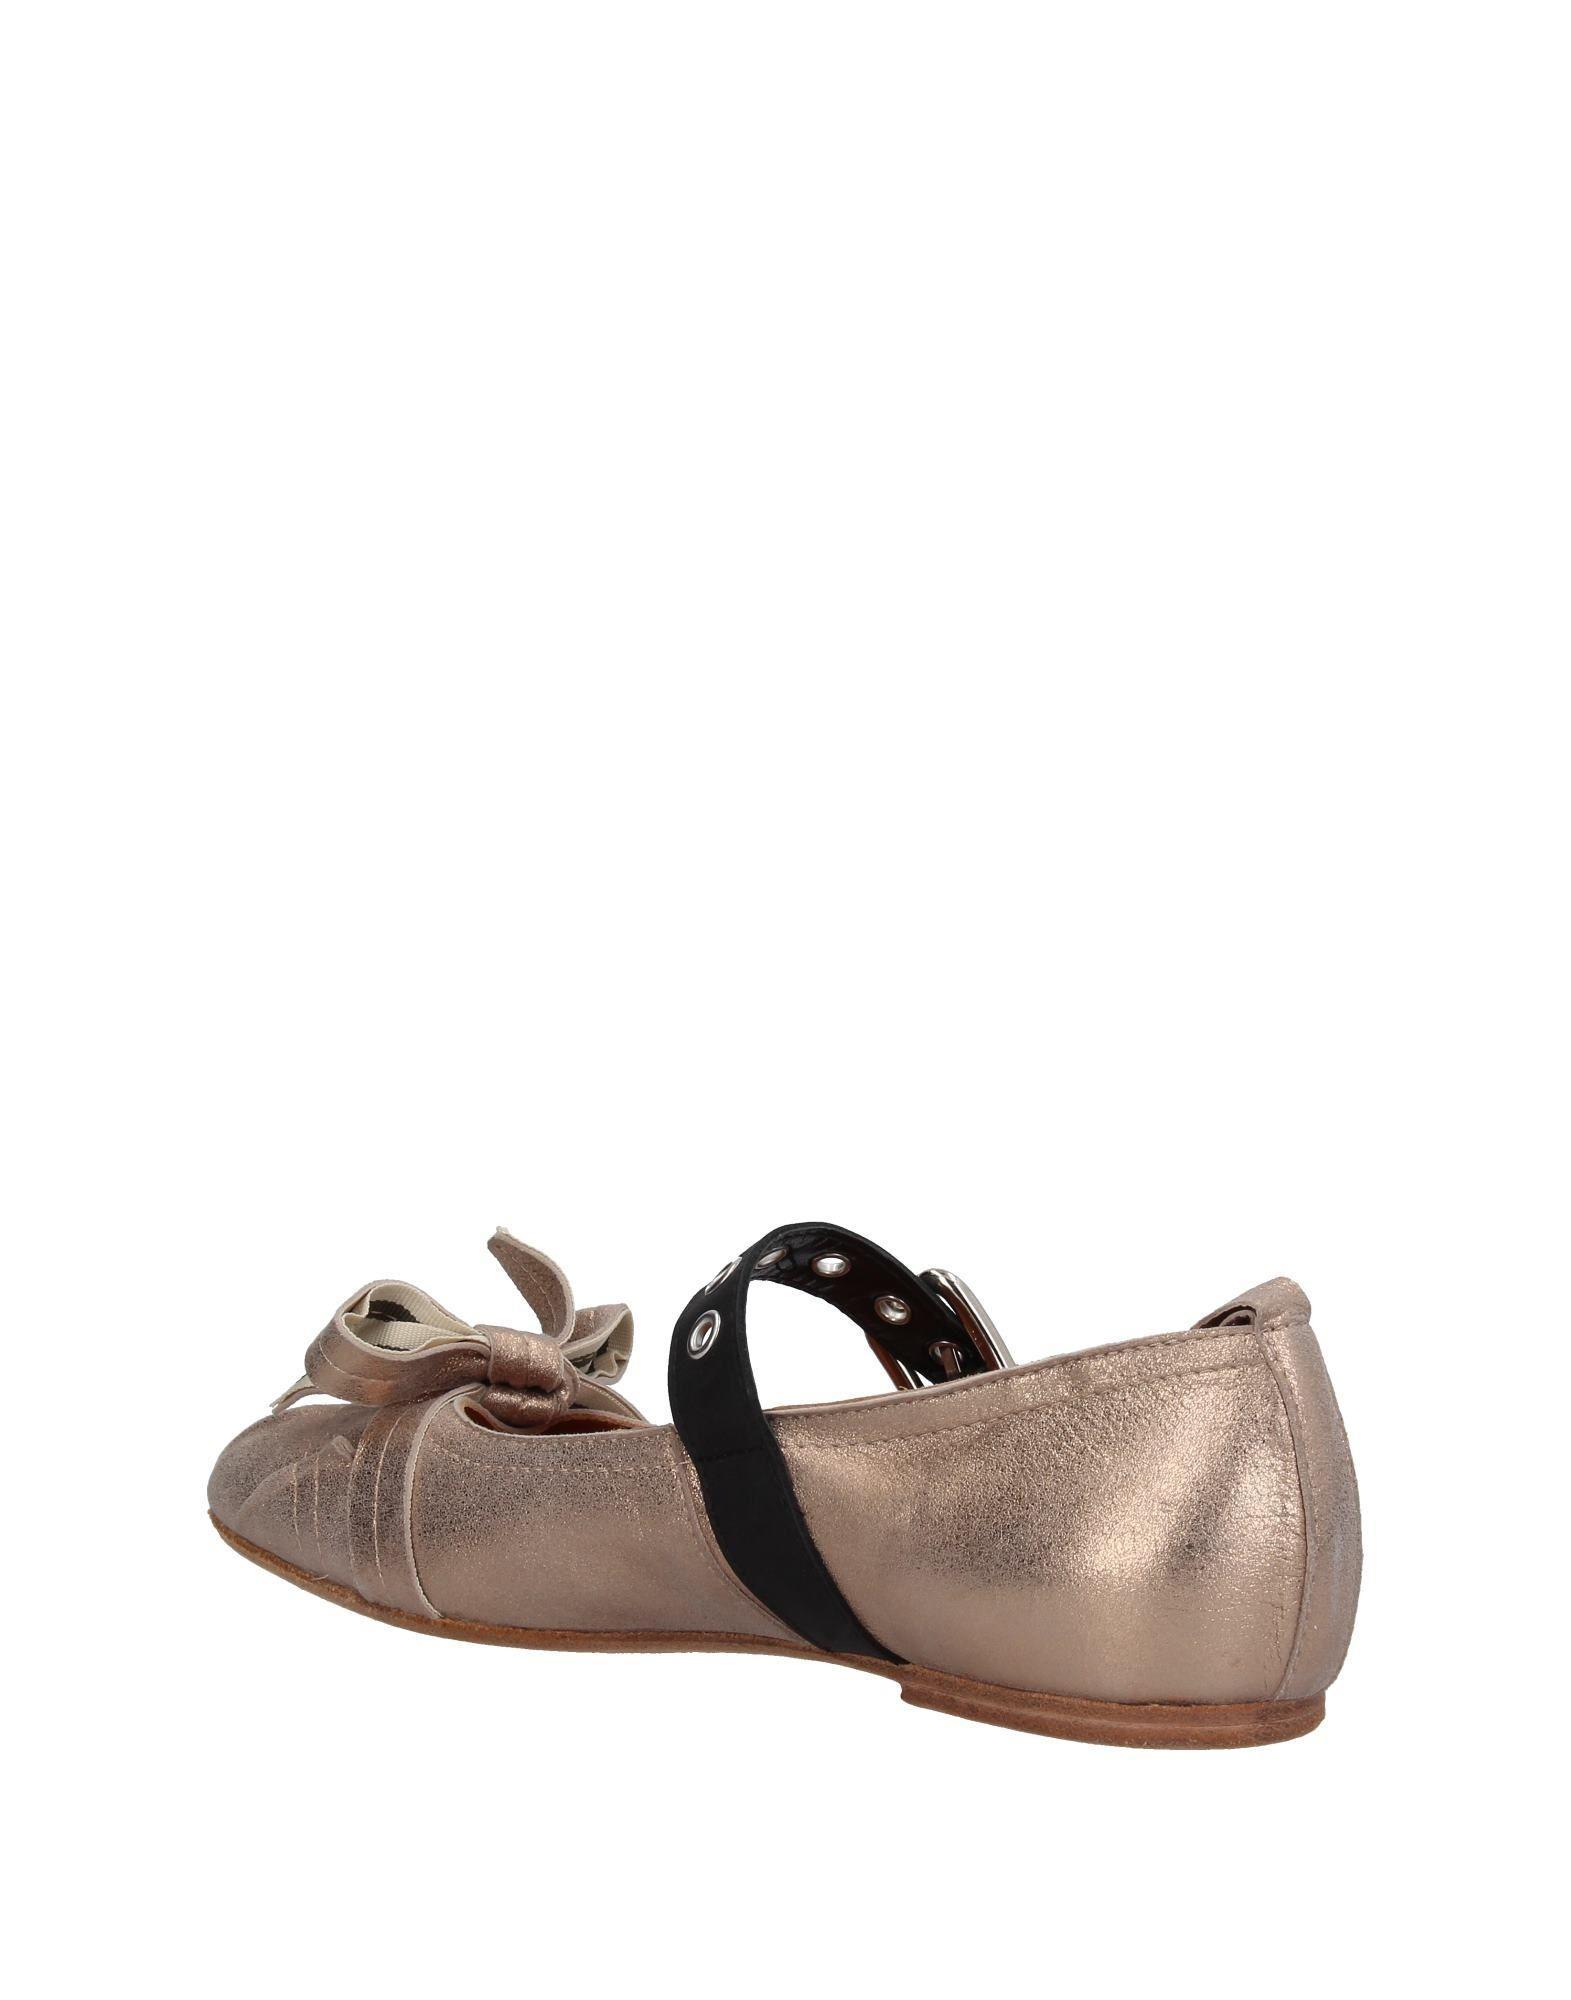 Chaussures - Ballerines Pierre Rustique 328Qb